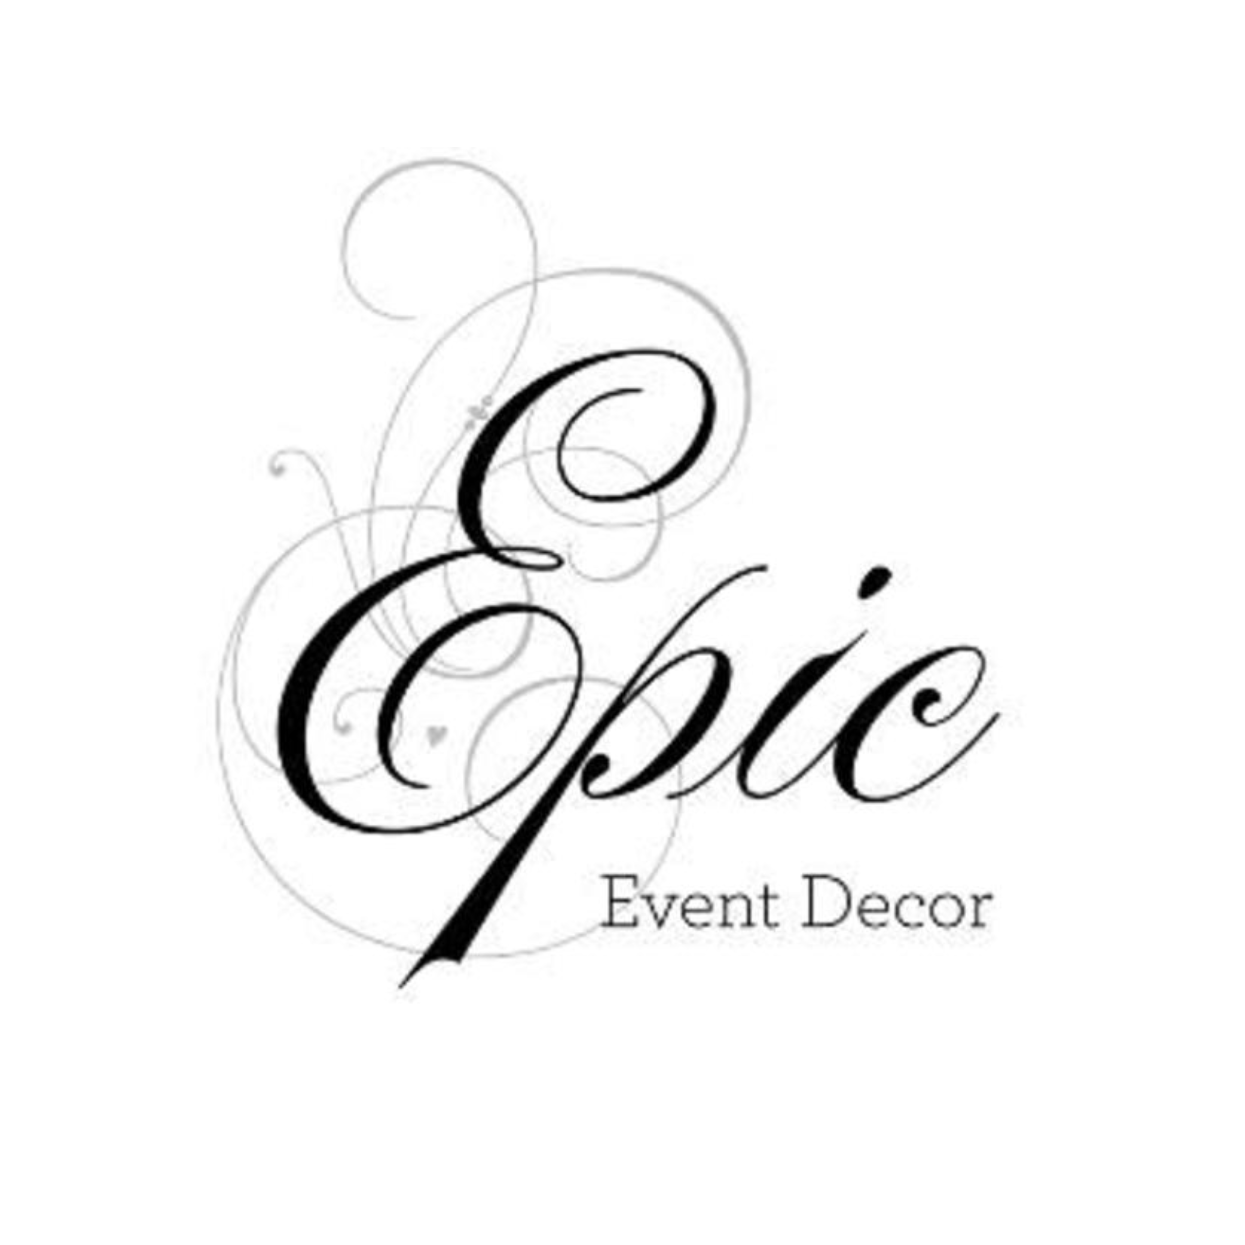 Epic Event Decor